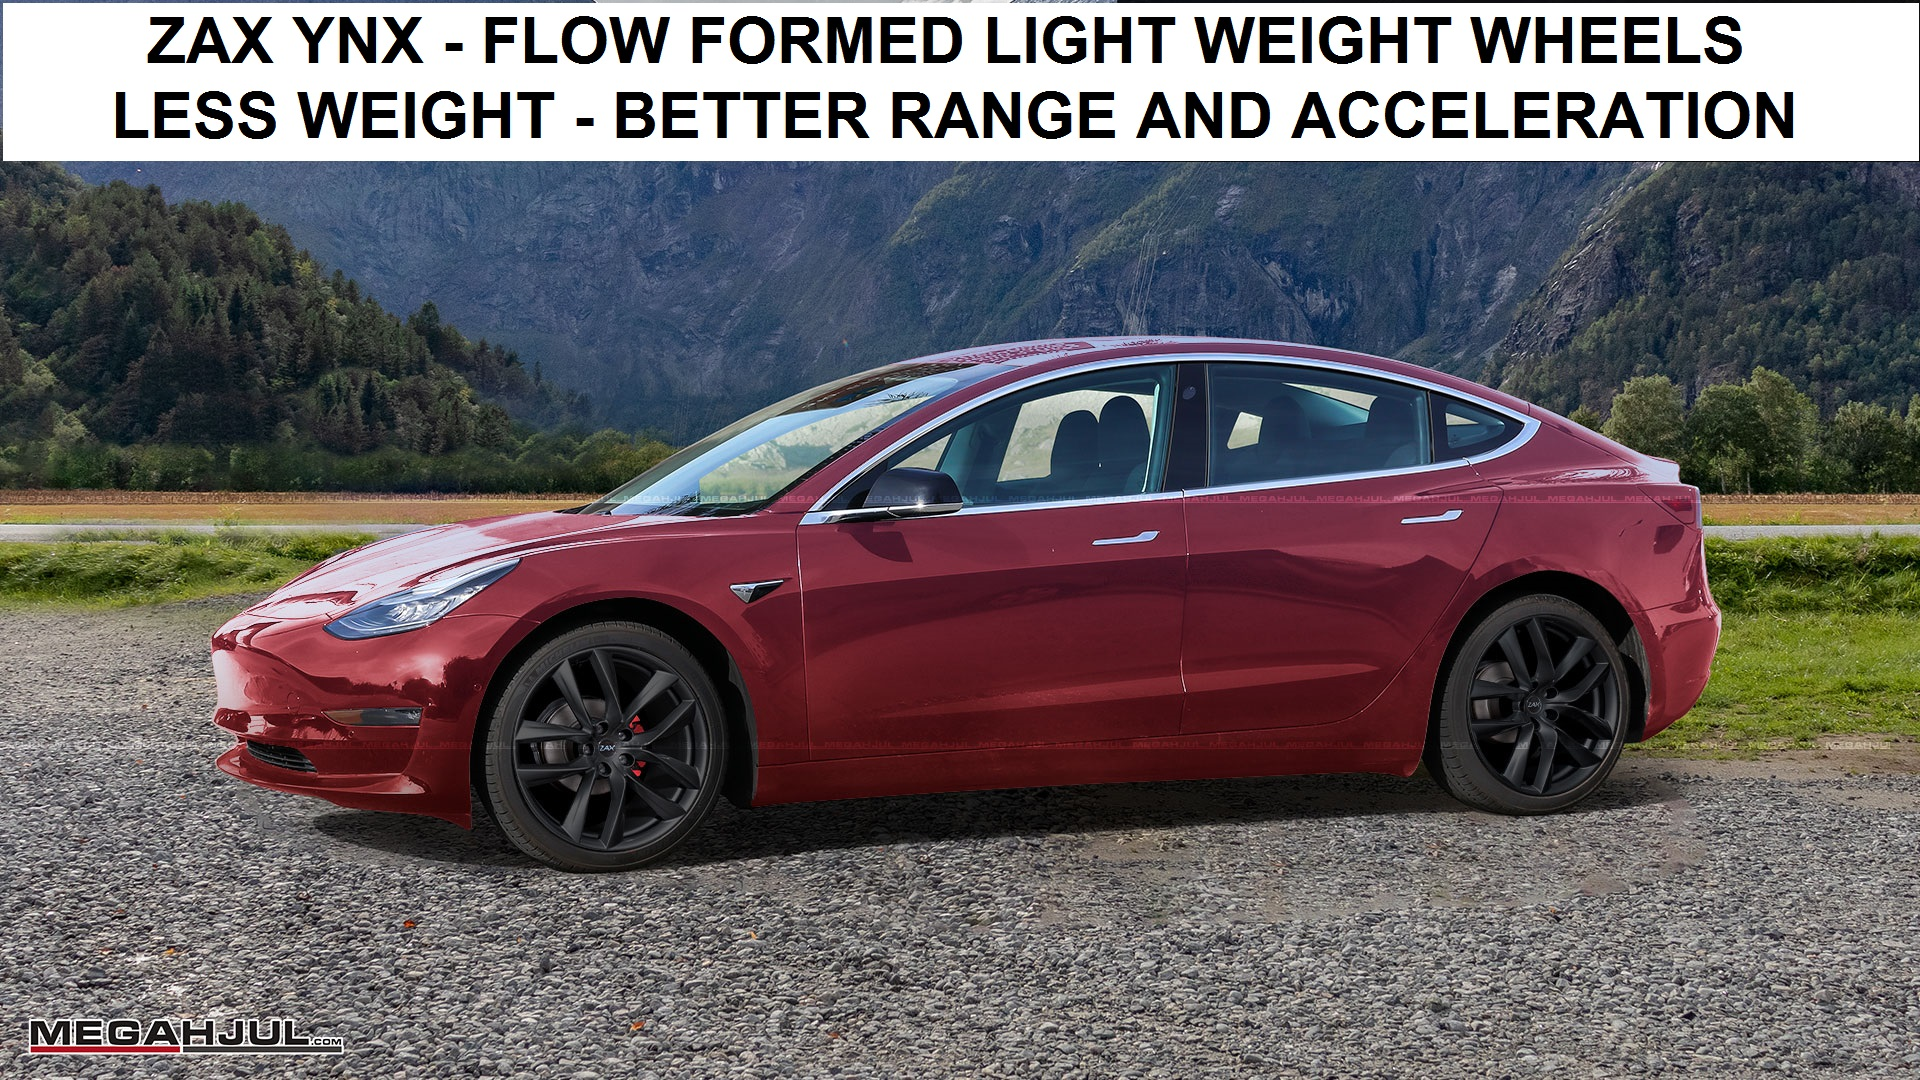 tesla-model-3-wheels-zax-light-weight-black-sorte-felger